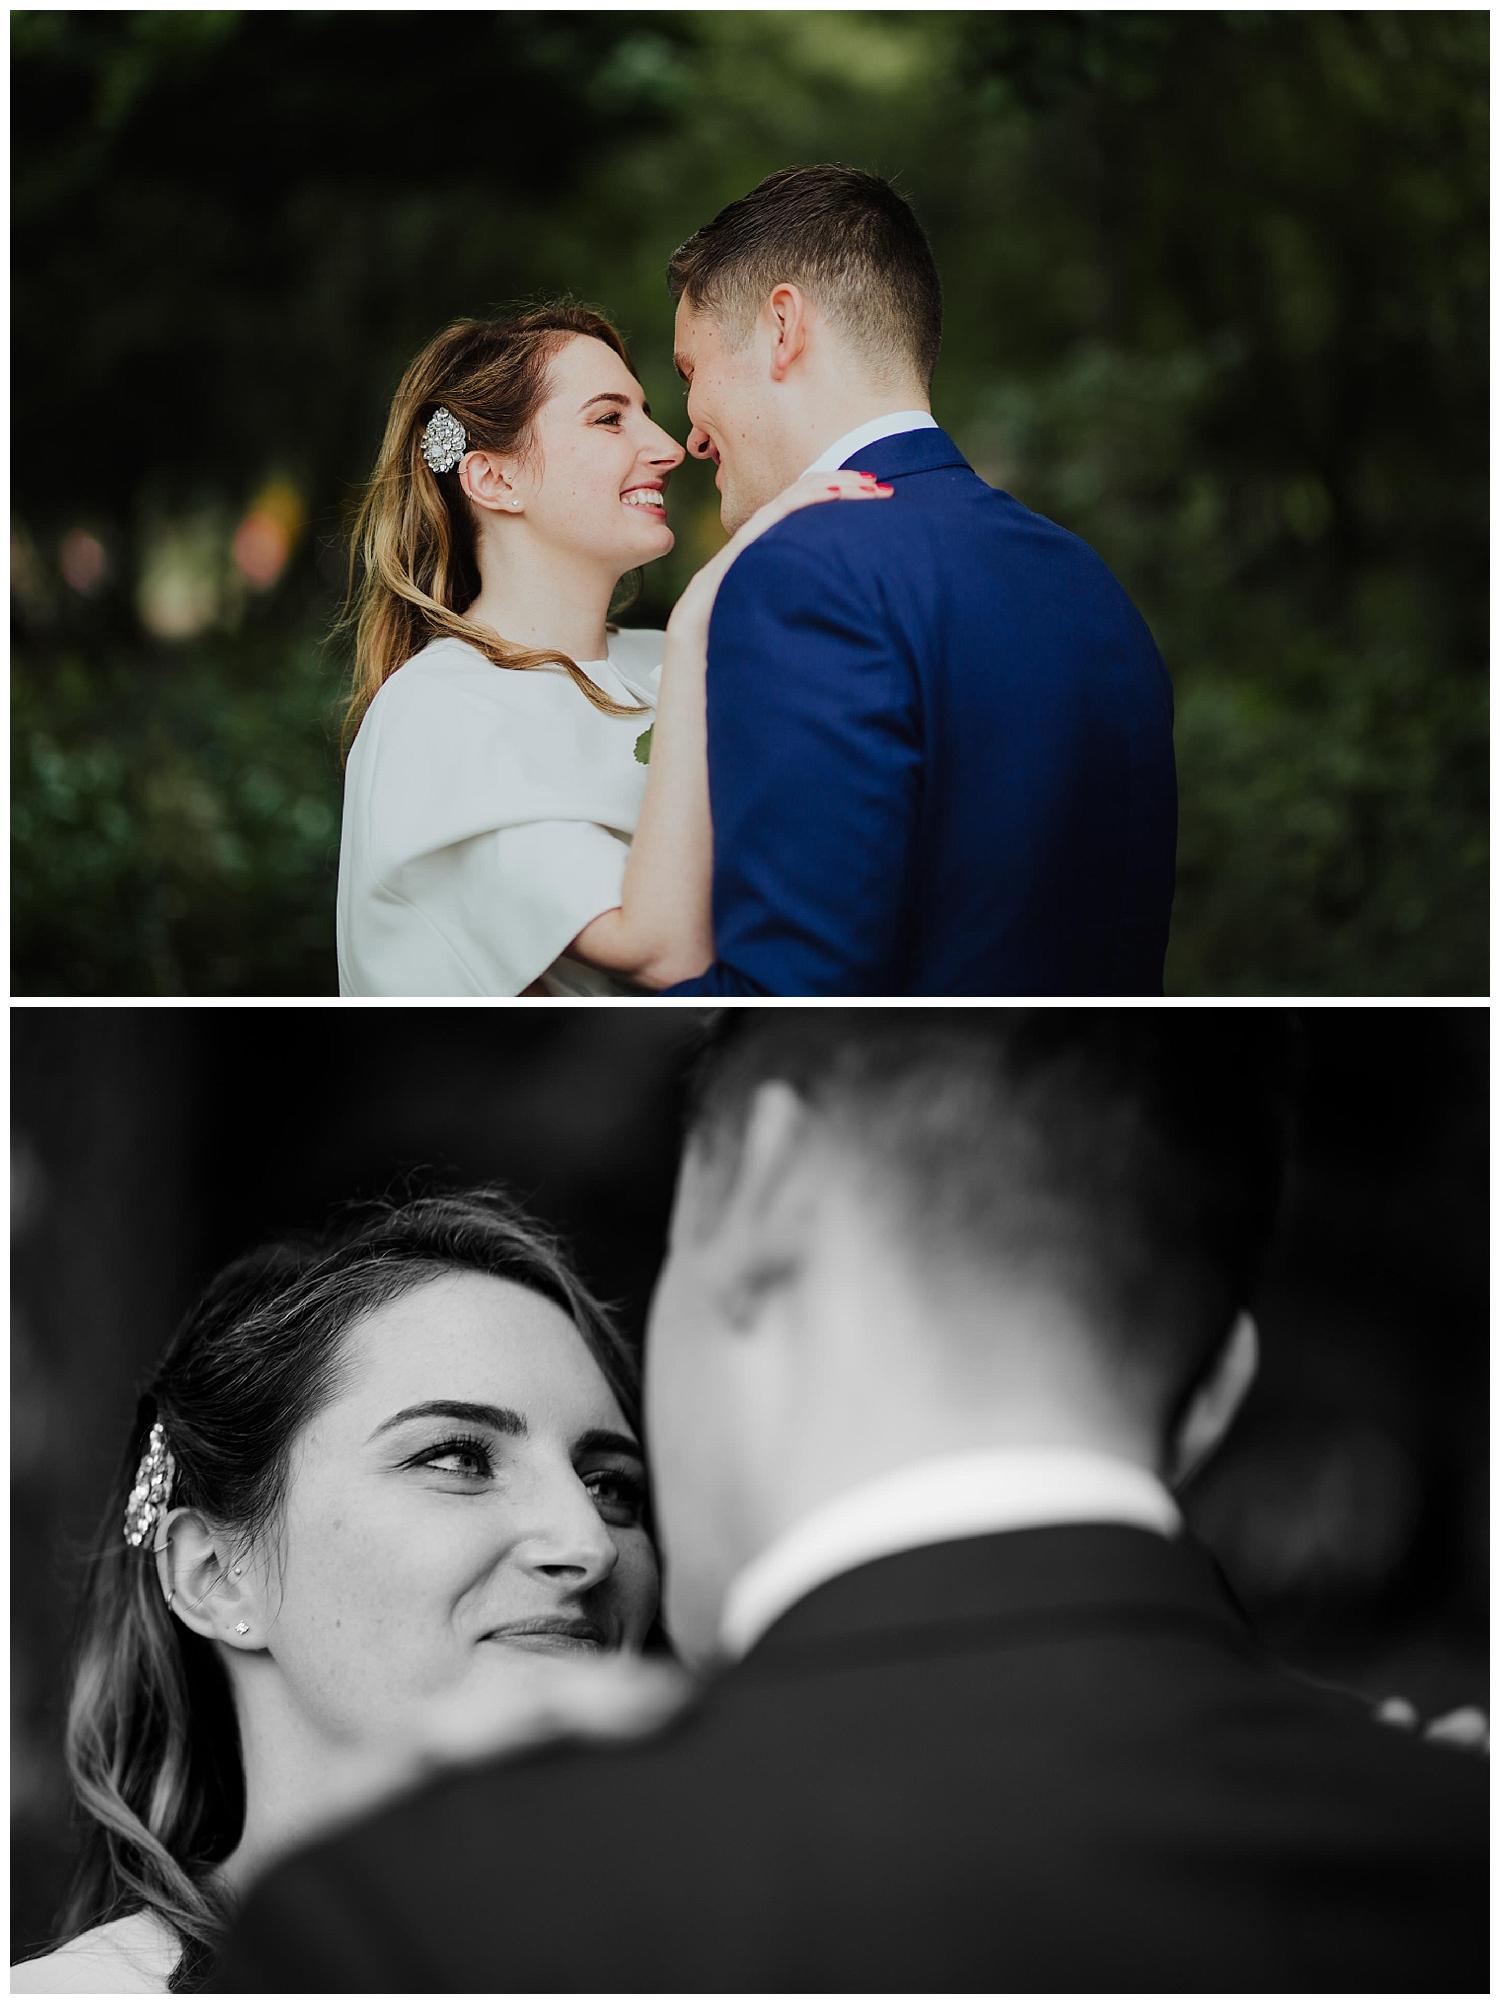 e&a_dublin_city_wedding_livia_figueiredo_523.jpg